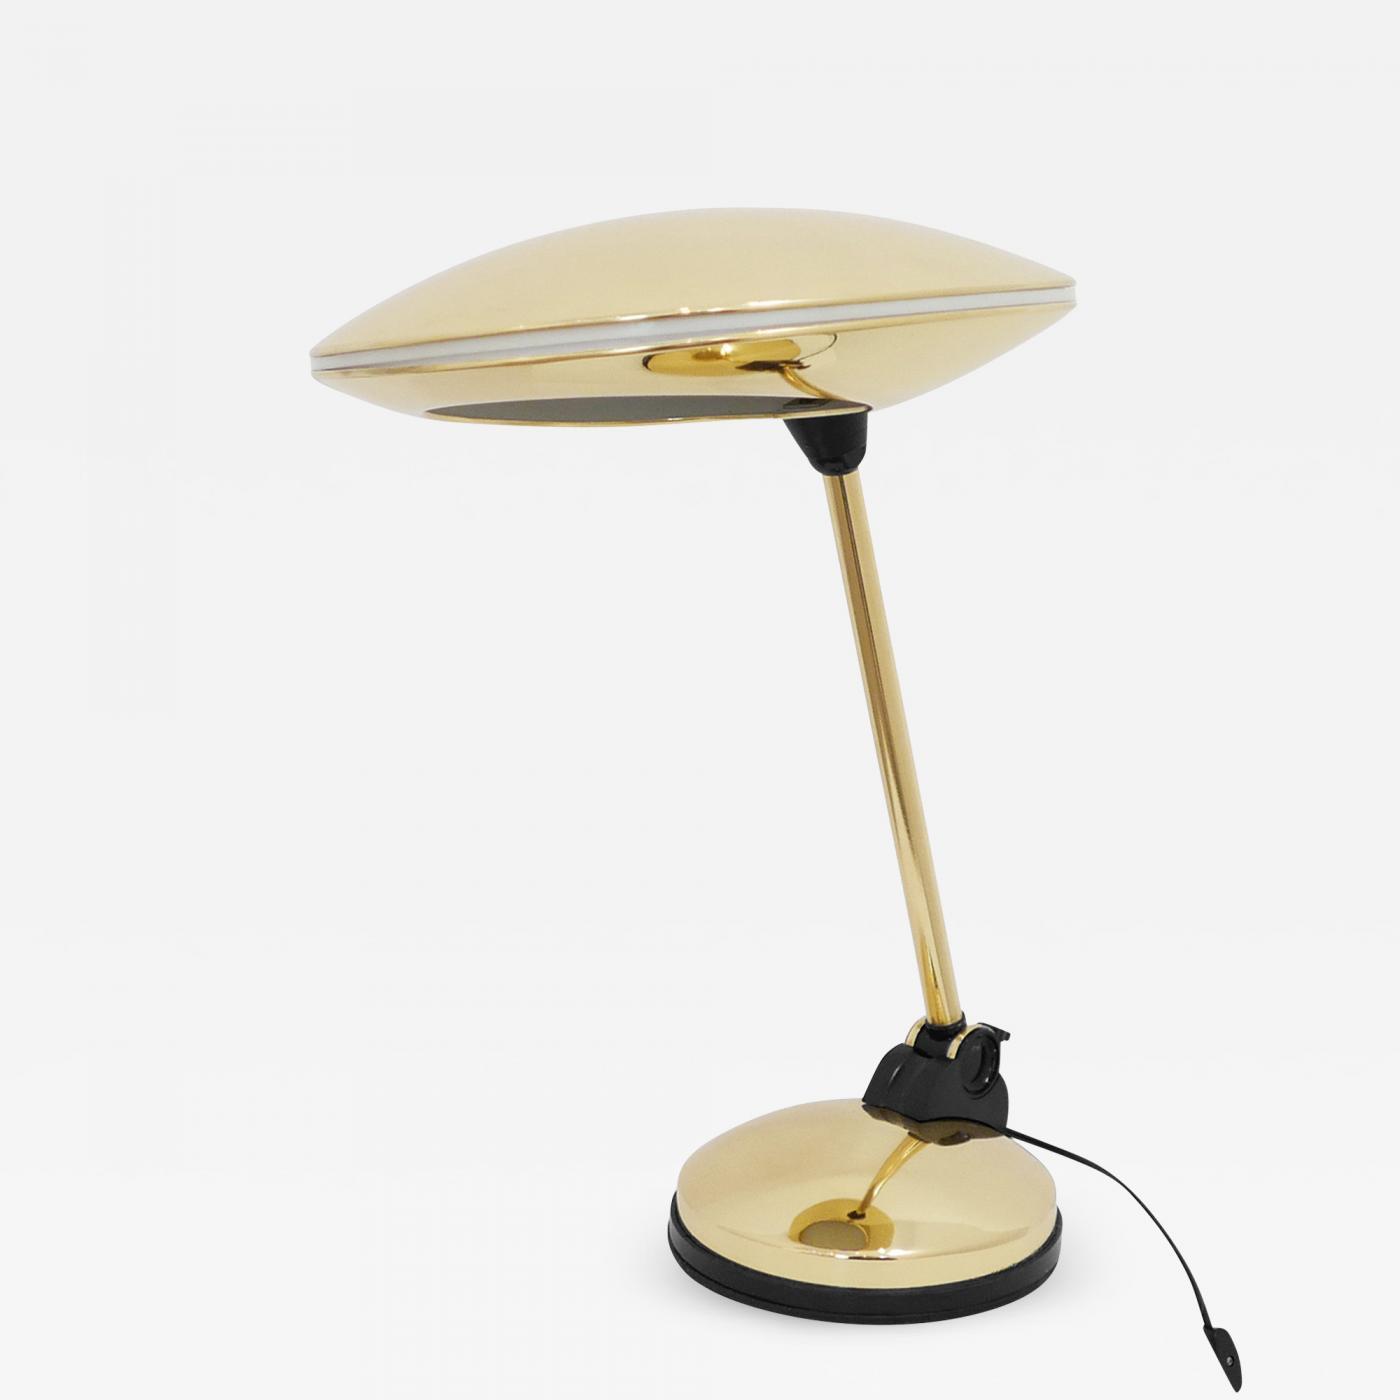 Ordinaire Listings / Furniture / Lighting / Table Lamps · Italian Table Lamp